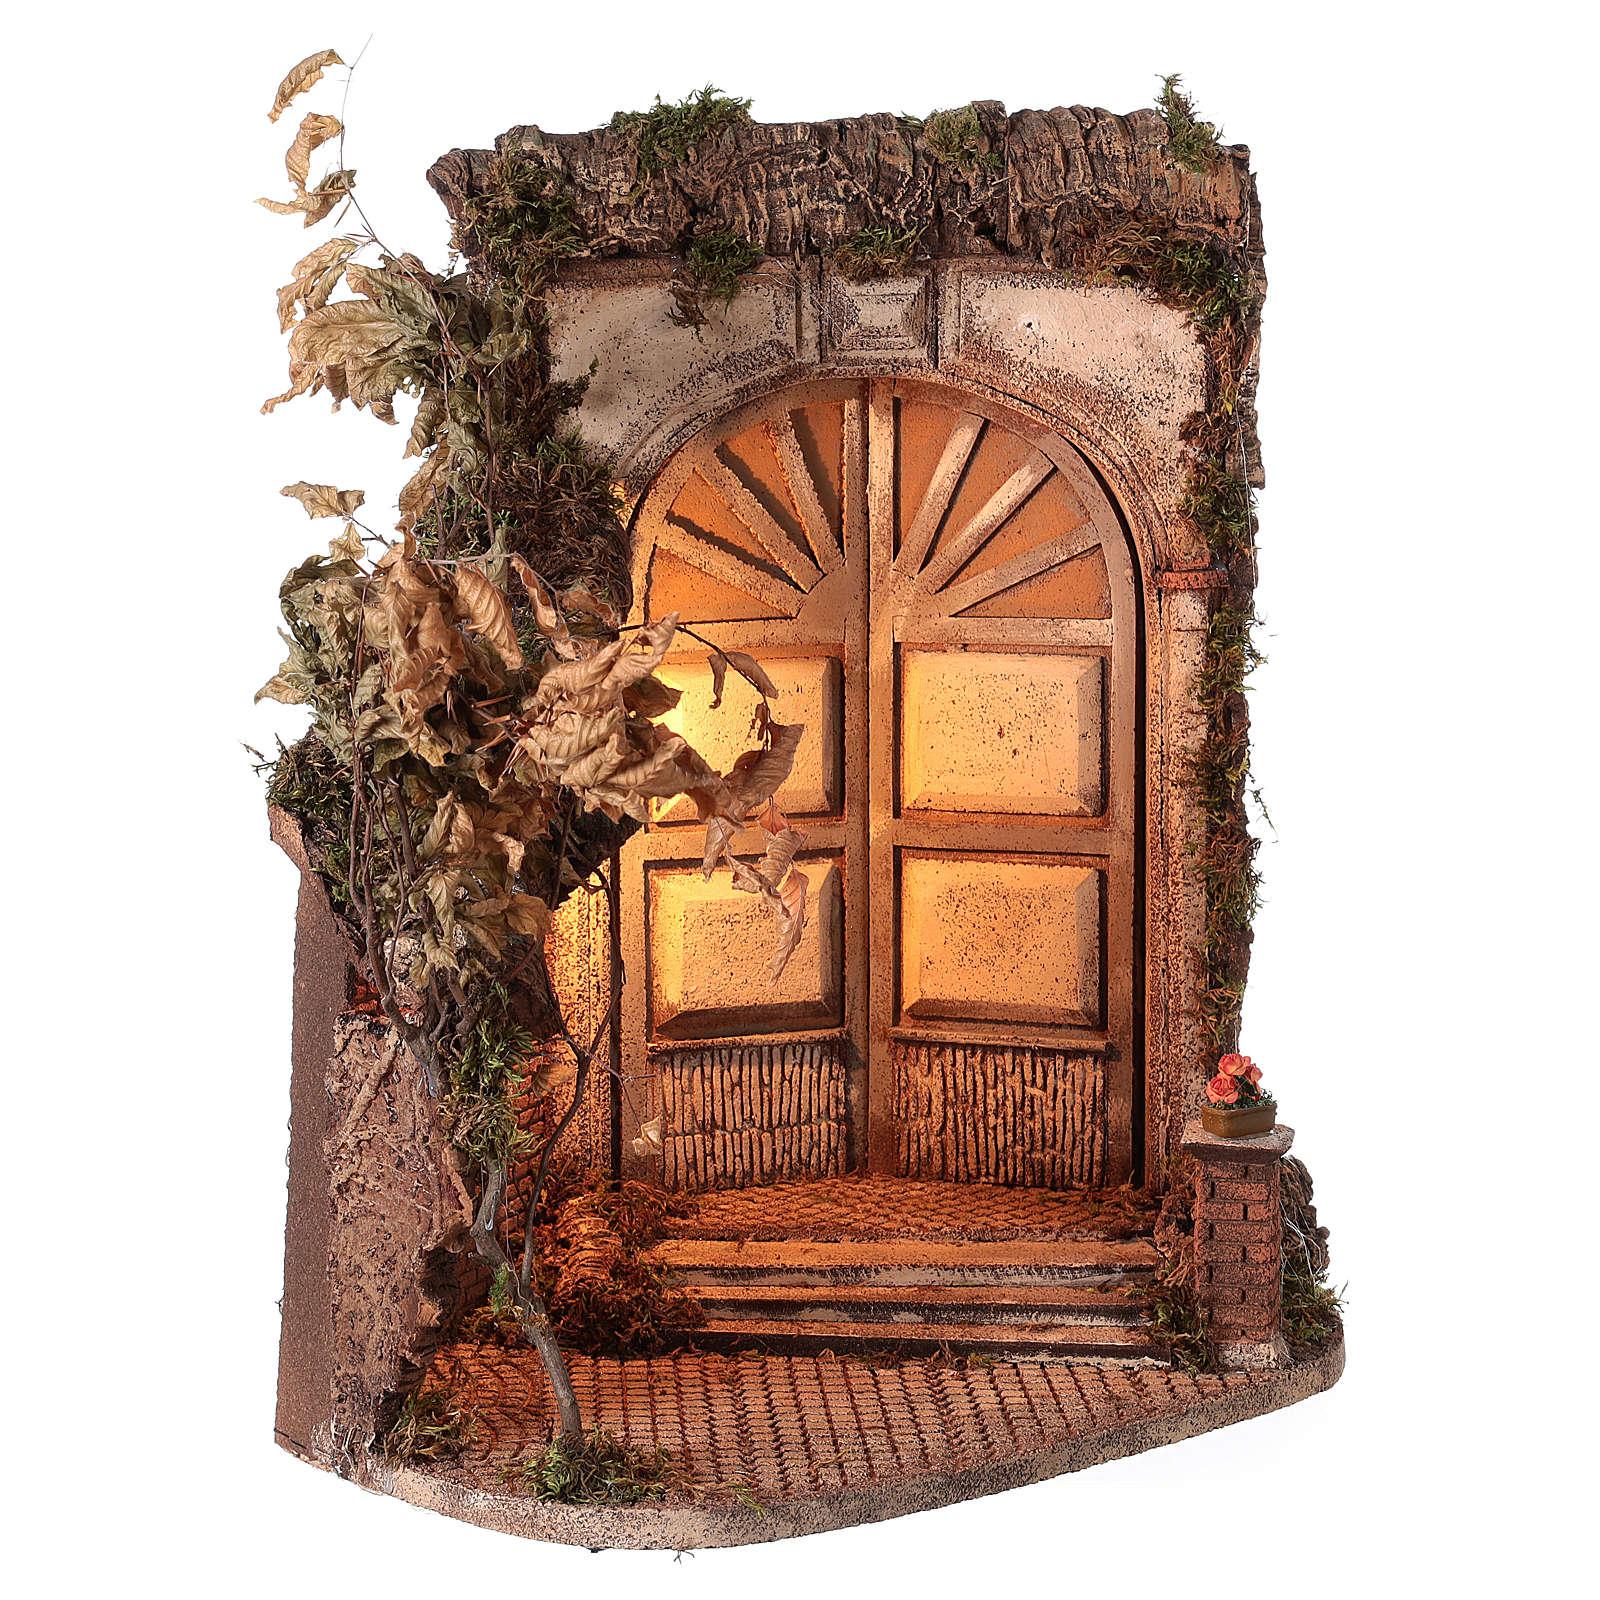 Capanna con porta e luce 55x50x35 presepe napoletano 24 cm 4